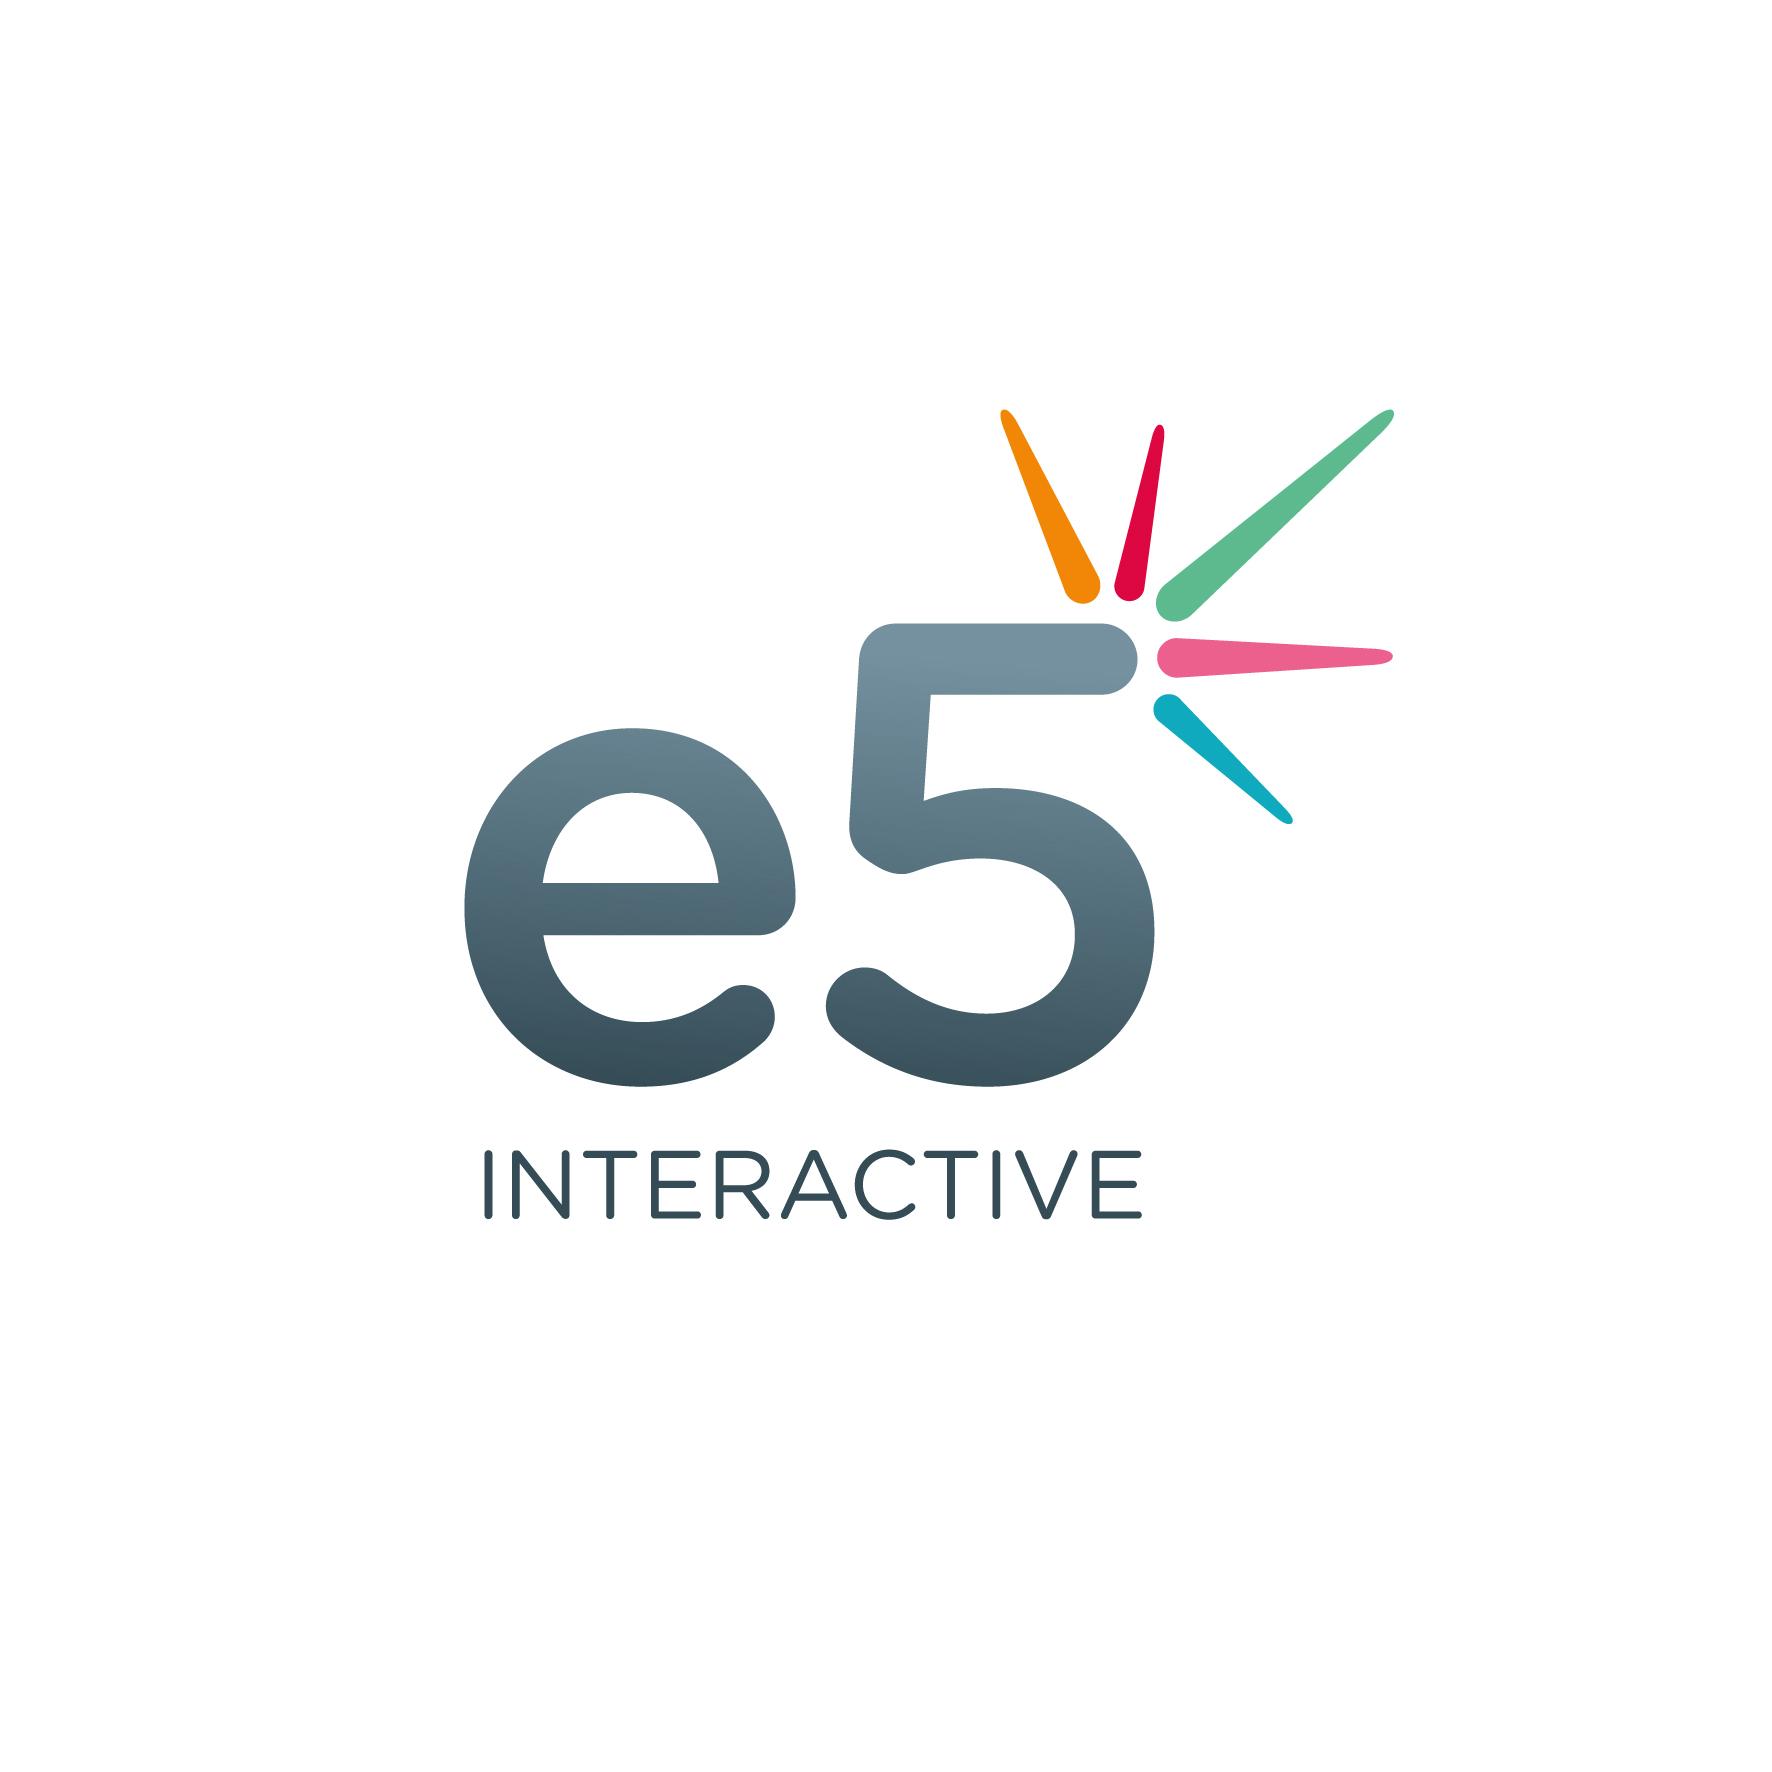 https://www.pro-manchester.co.uk/wp-content/uploads/2020/10/e5_Interactive_Logo.jpg